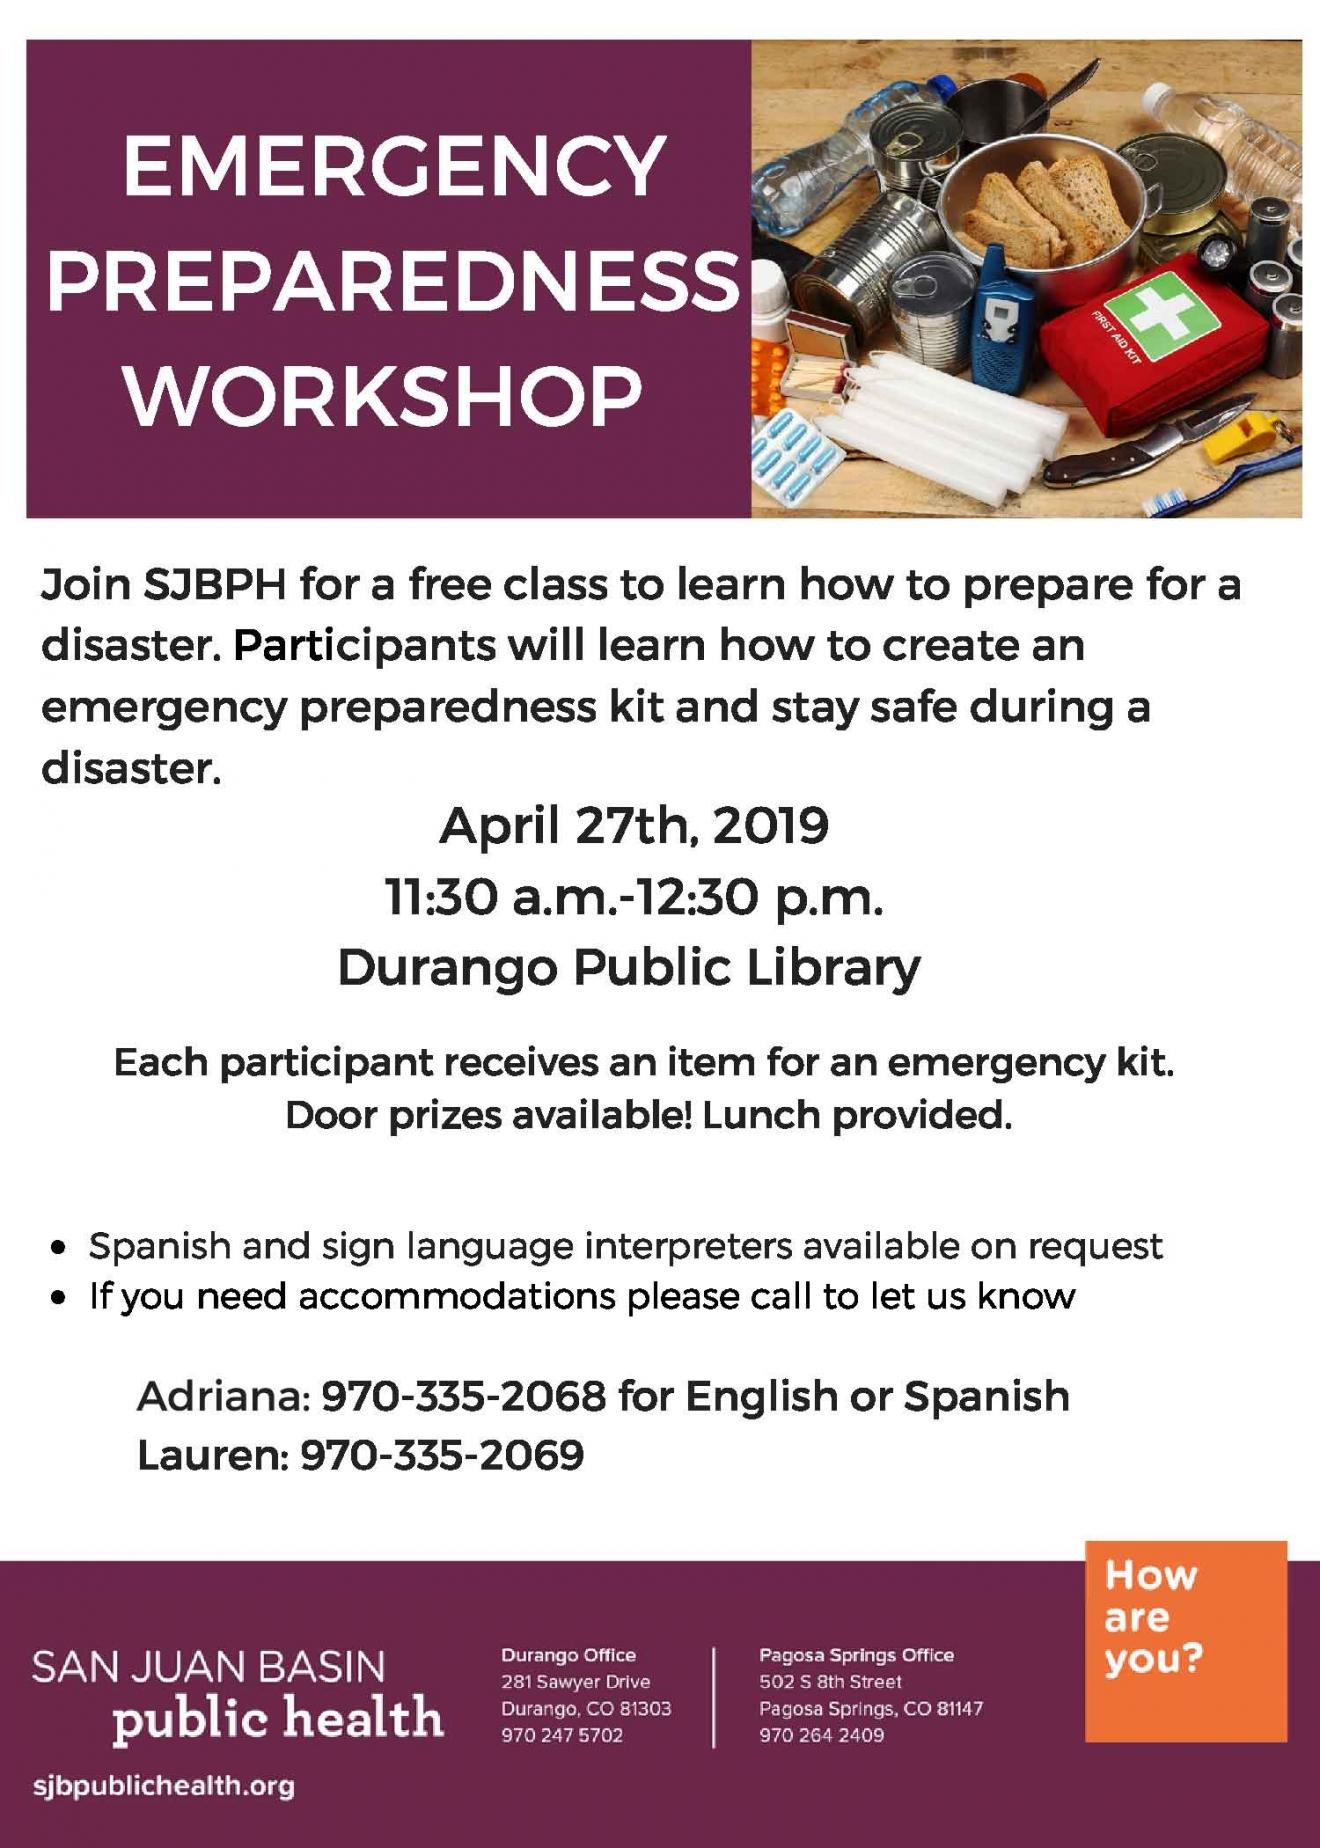 4.27.2019-Emergency-Preparedness-Workshop